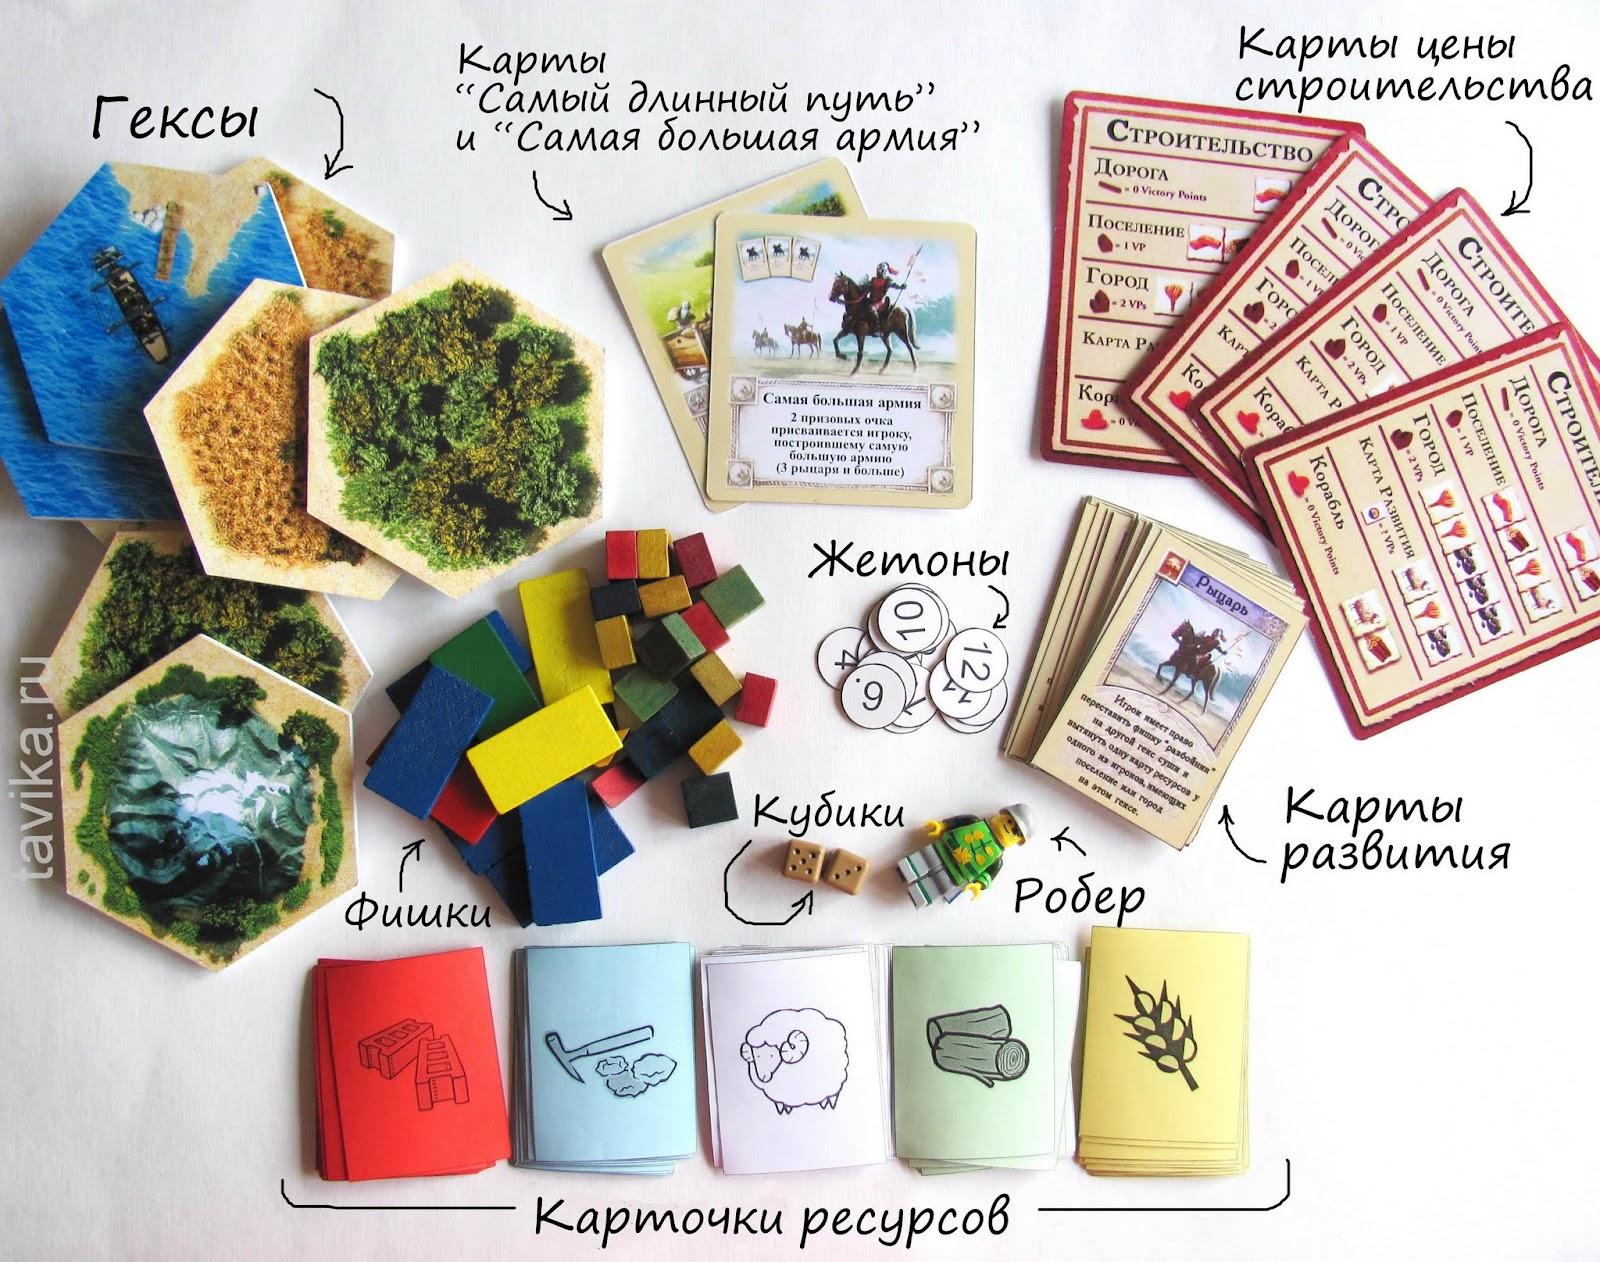 Настольная игра Катан - комплектация